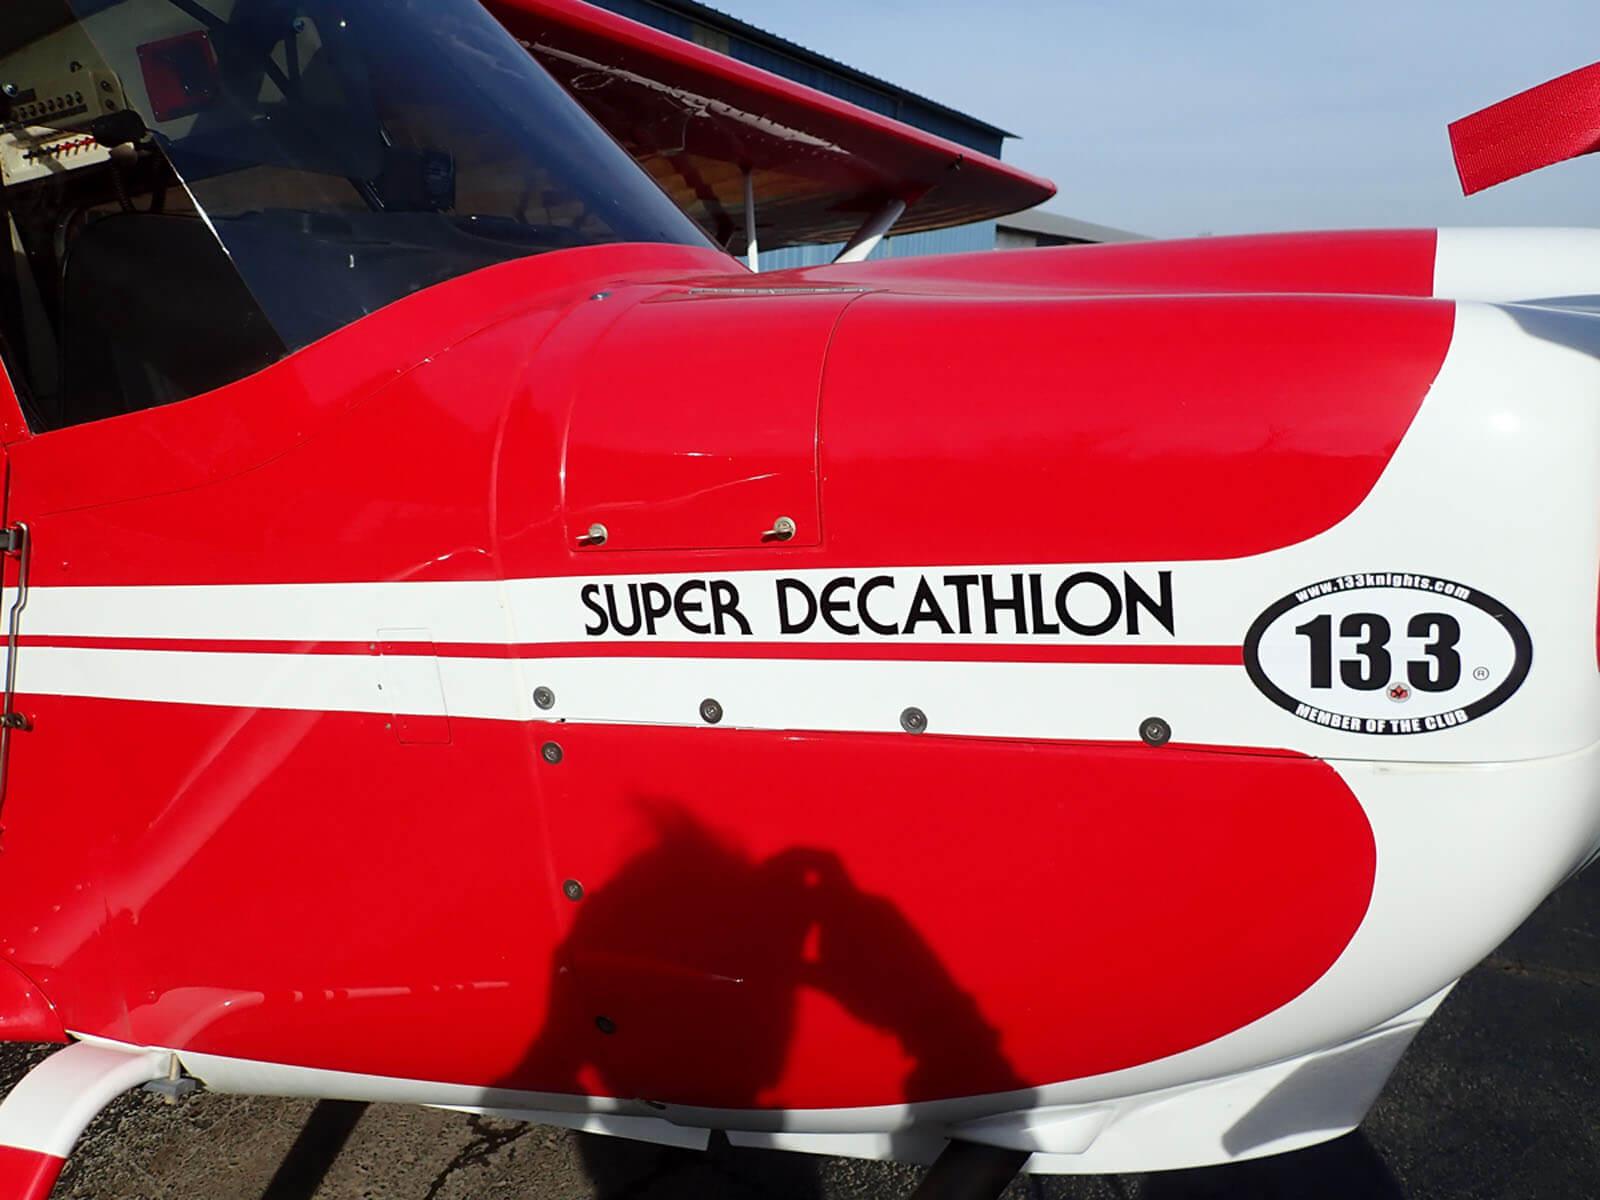 2012 American Champion Super Decathlon - FOR SALE at Princeton Airport